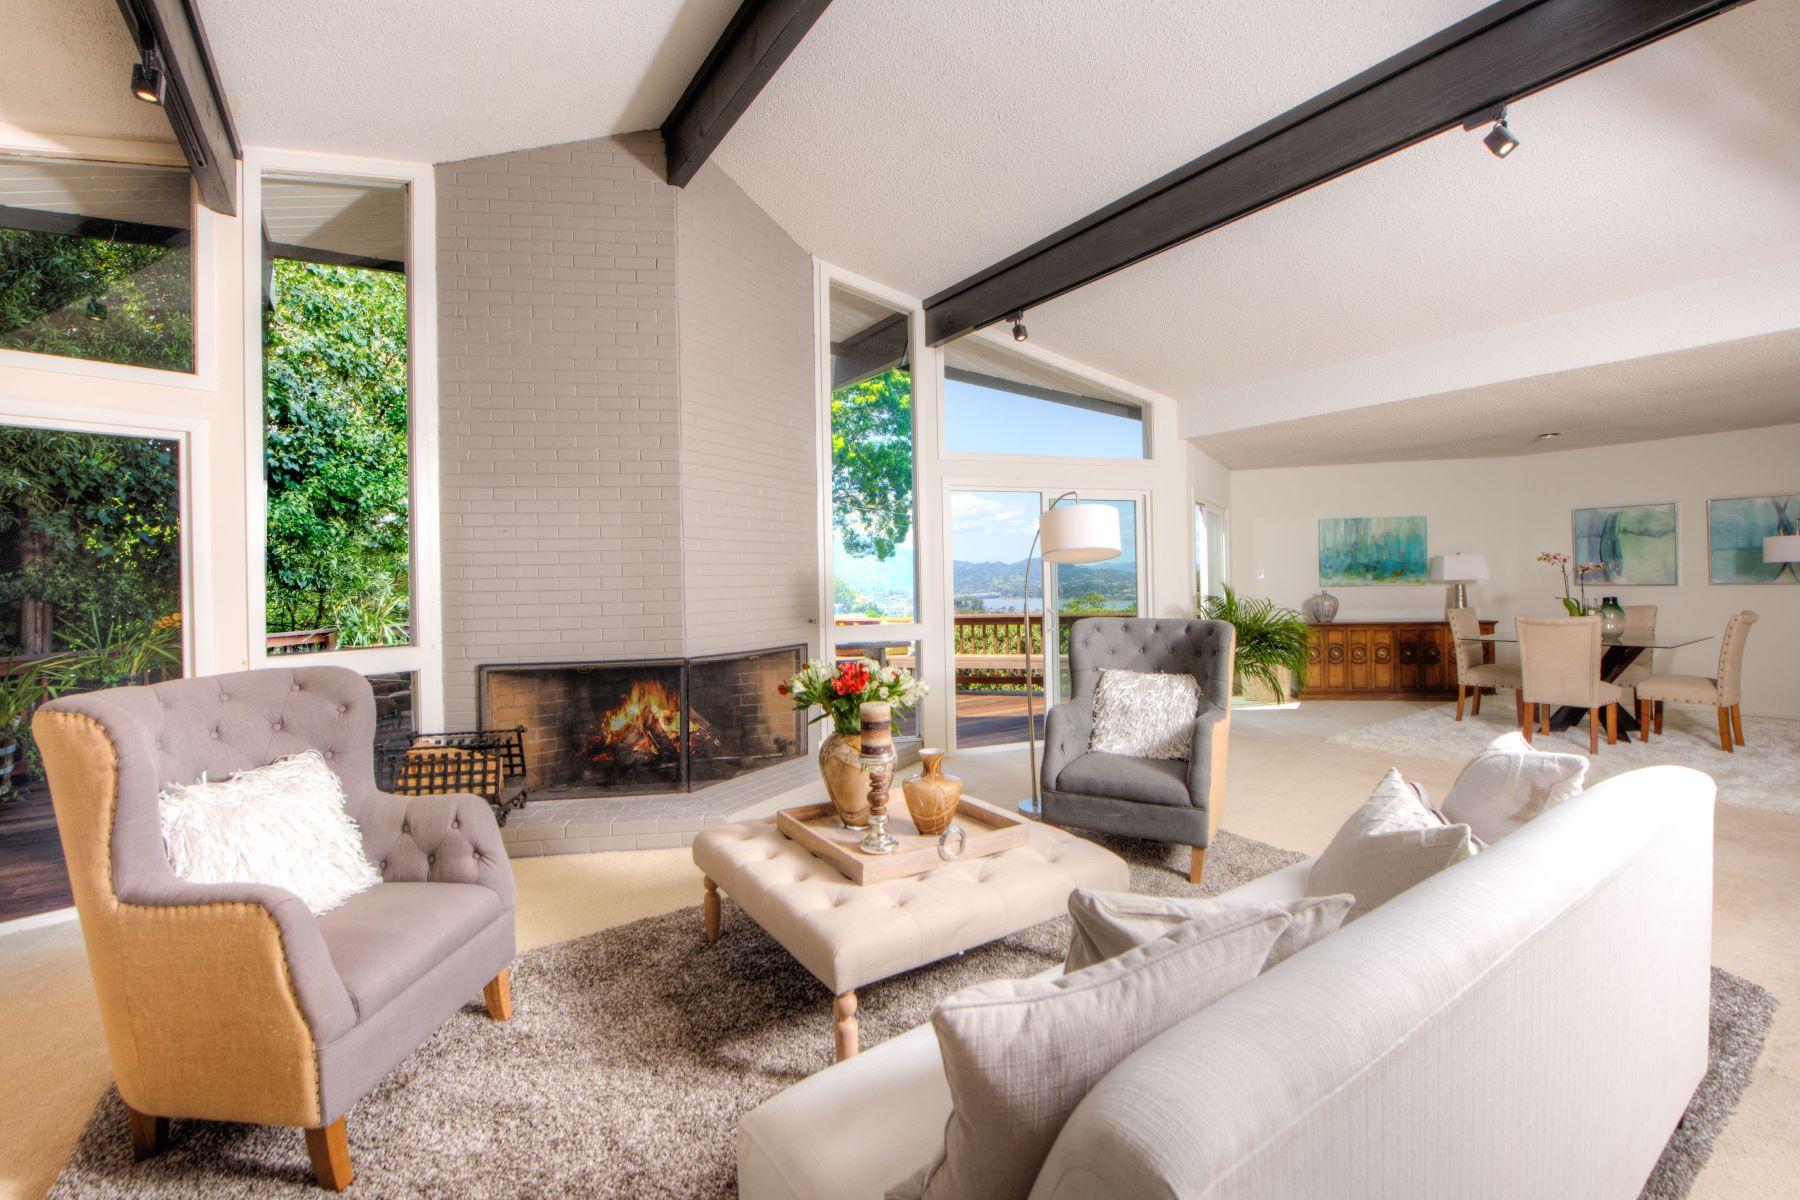 Single Family Home for Sale at Sausalito! Single Level Mid Century Modern! 38 Platt Avenue Sausalito, California 94965 United States